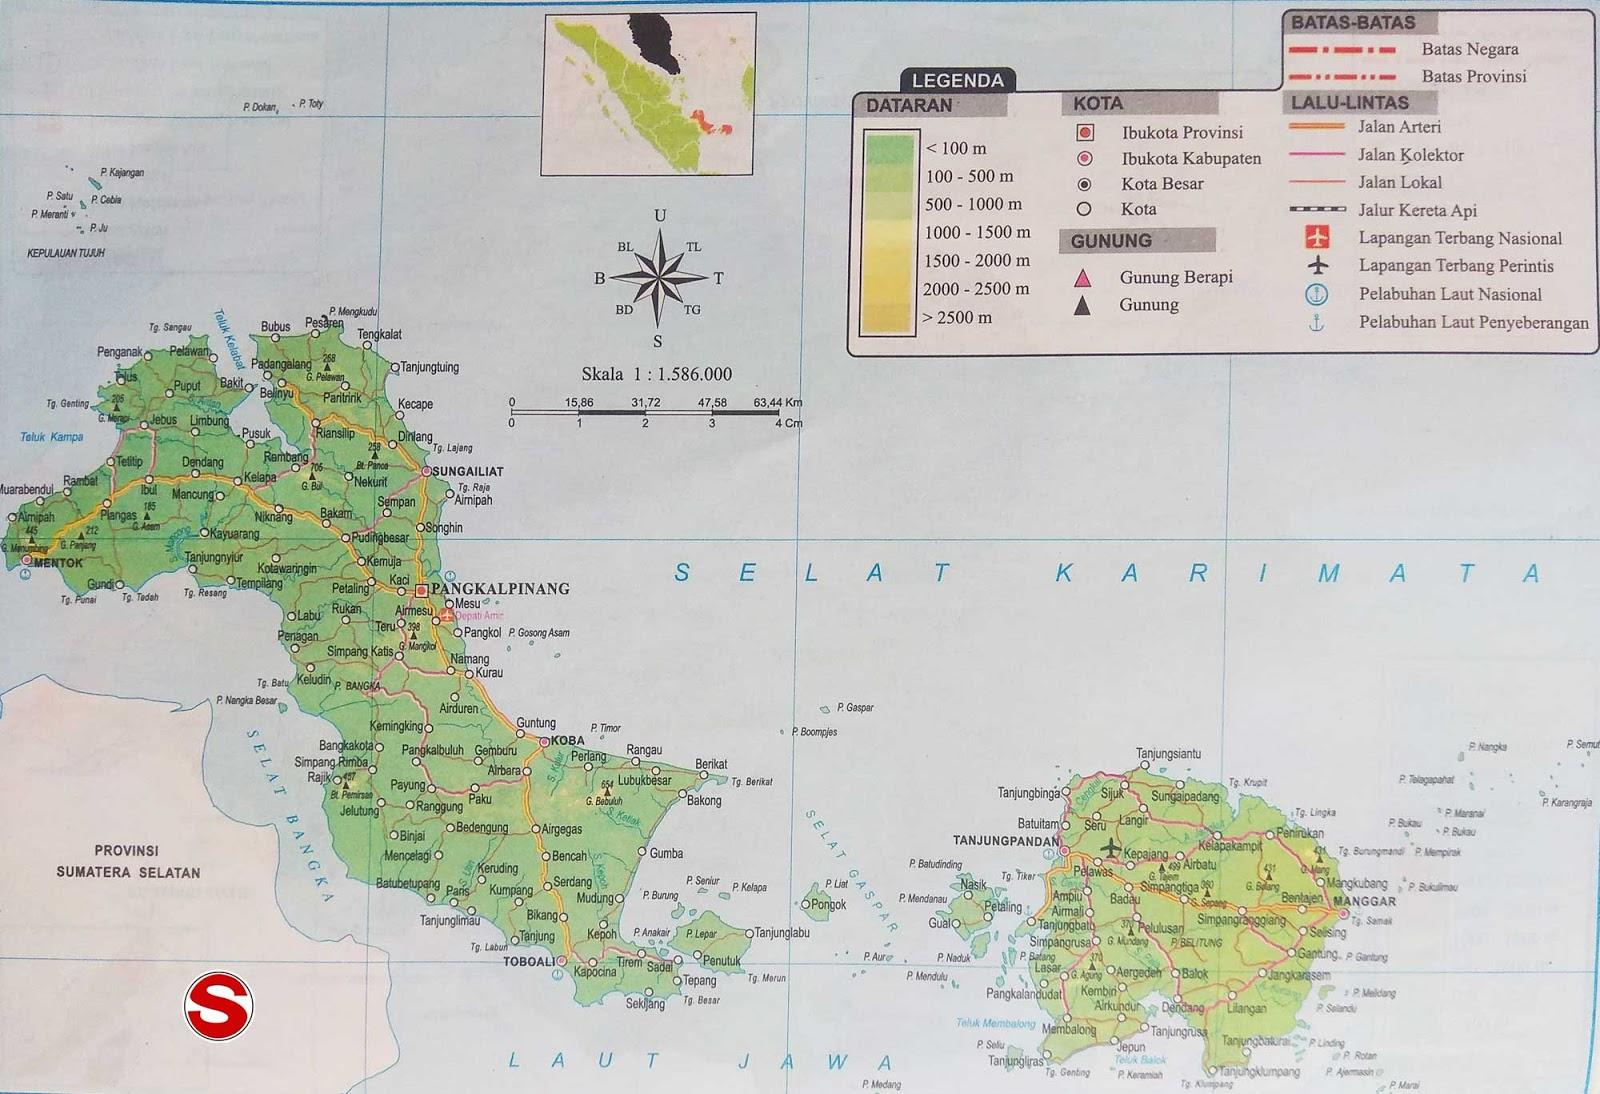 Gambar Peta Atlas Provinsi Bangka Belitung